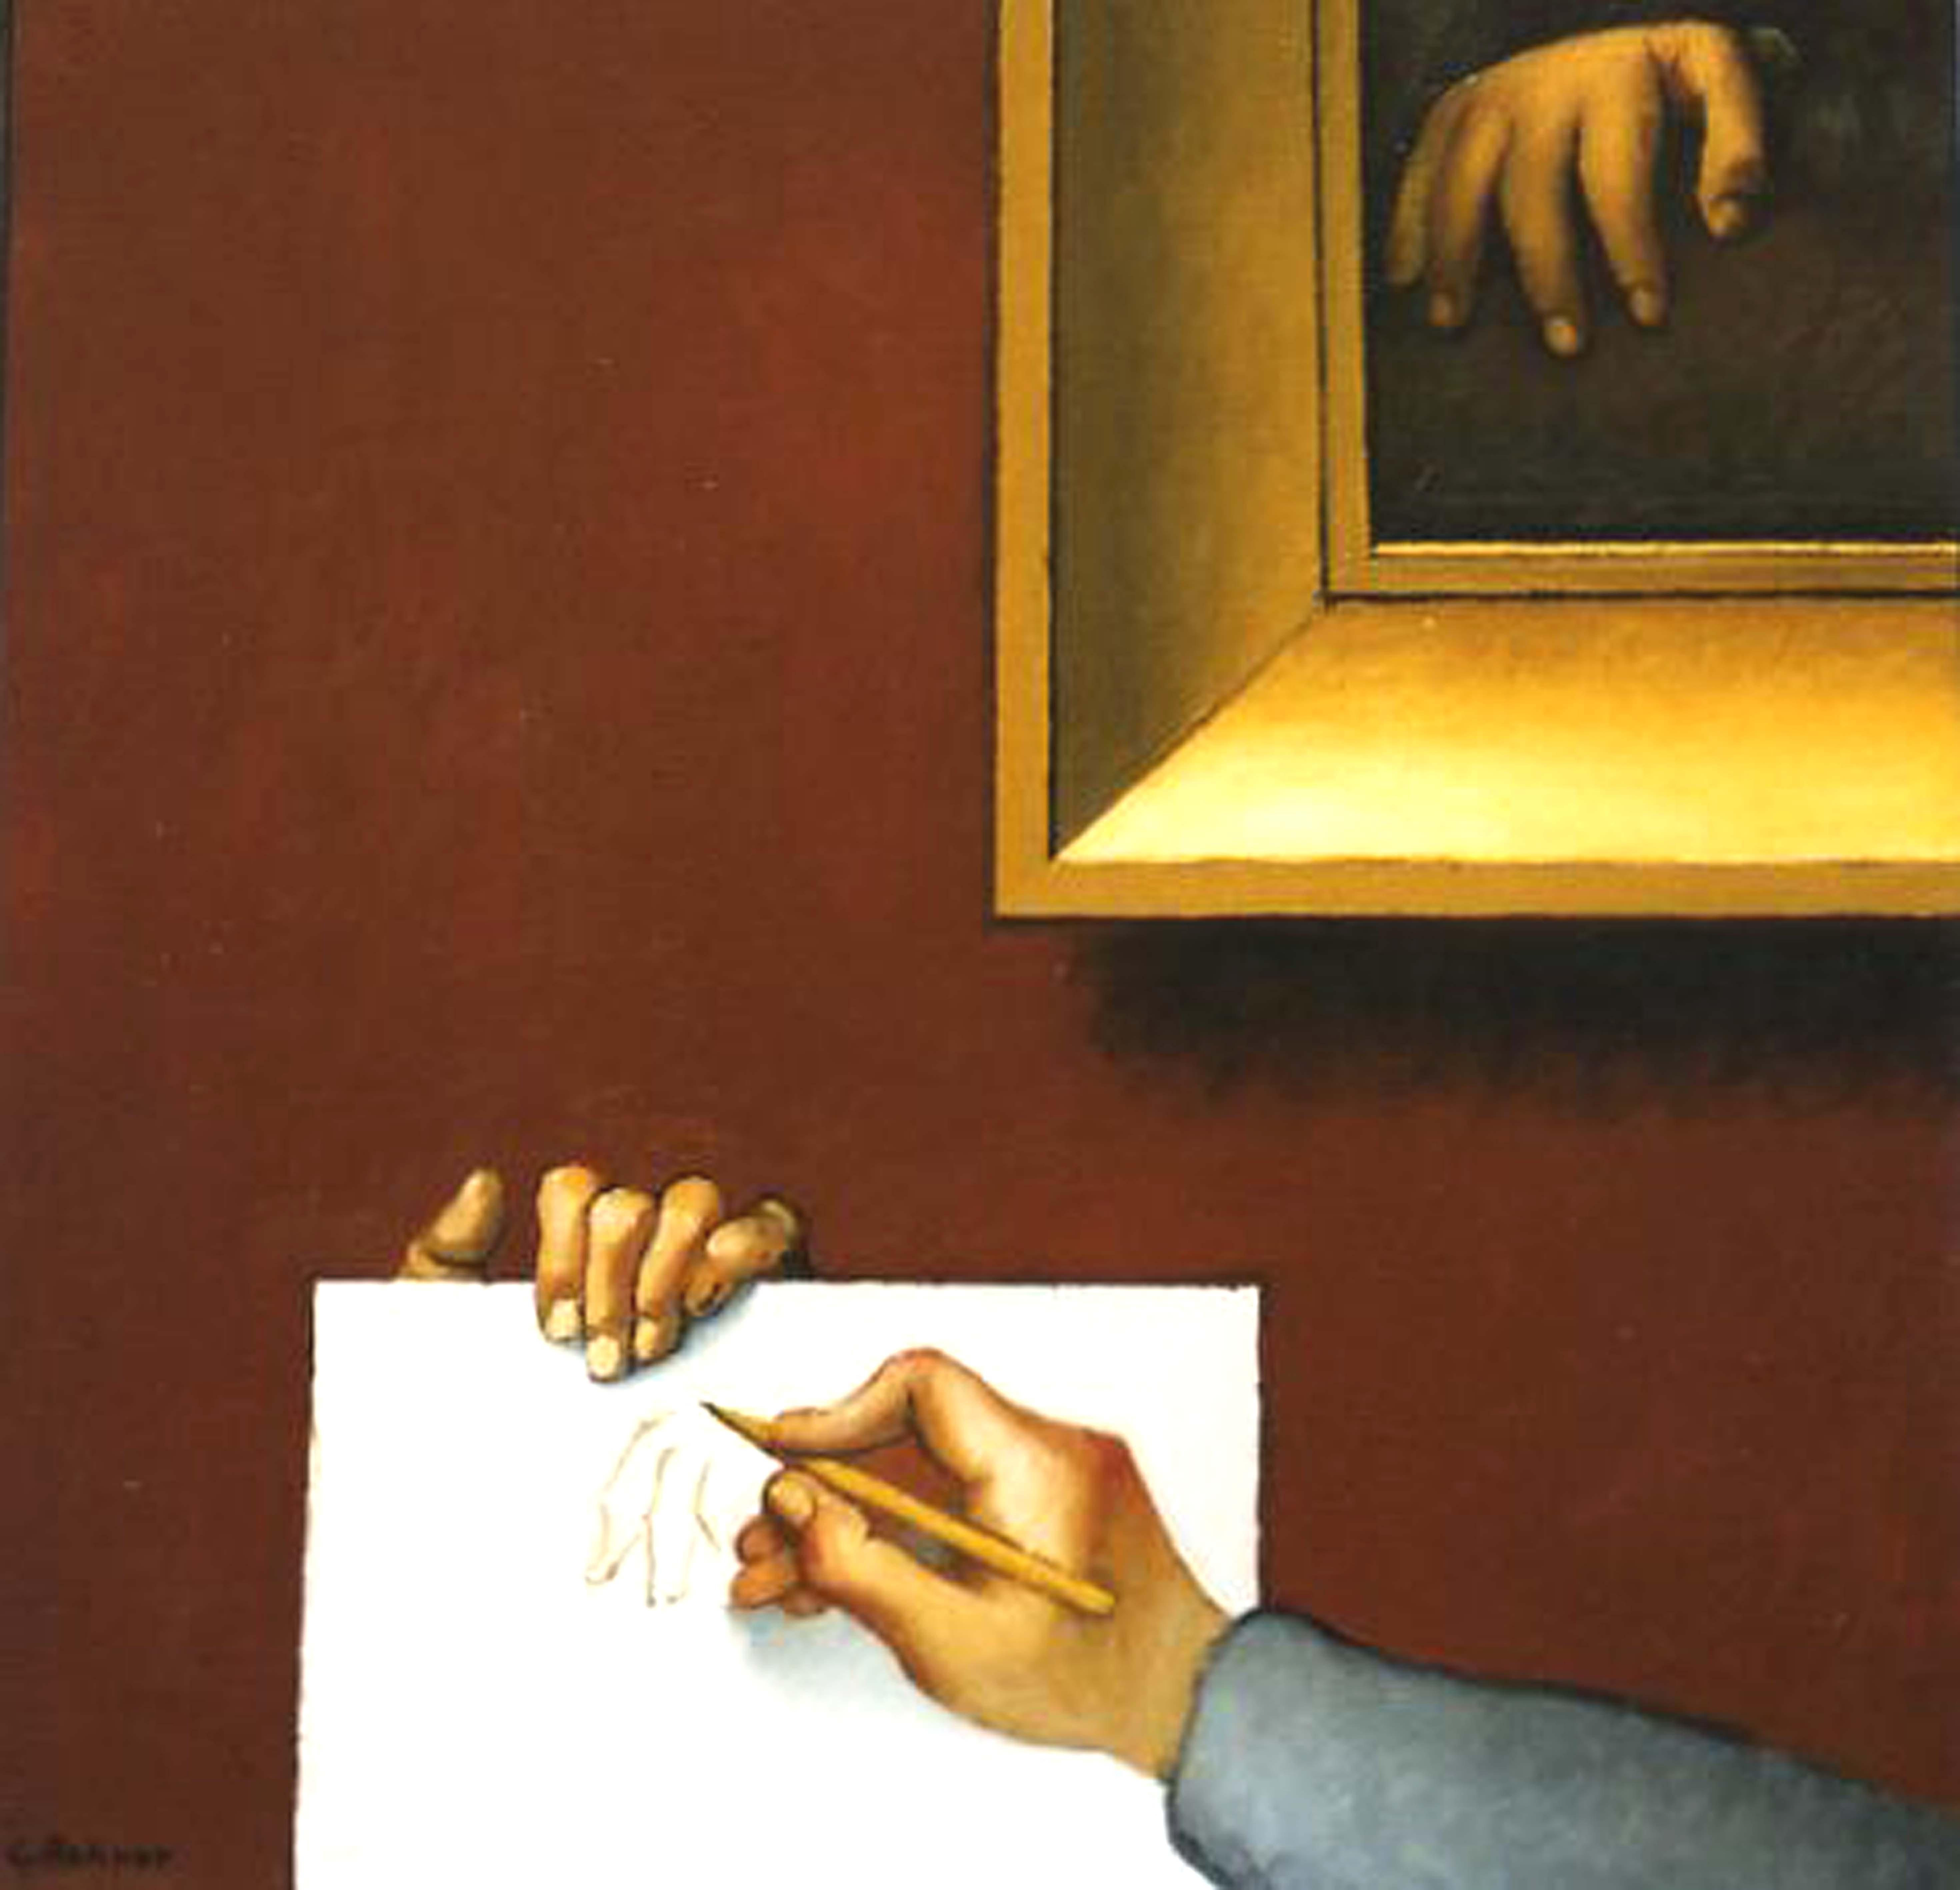 L'artiste dessinant la main de M. BERTIN